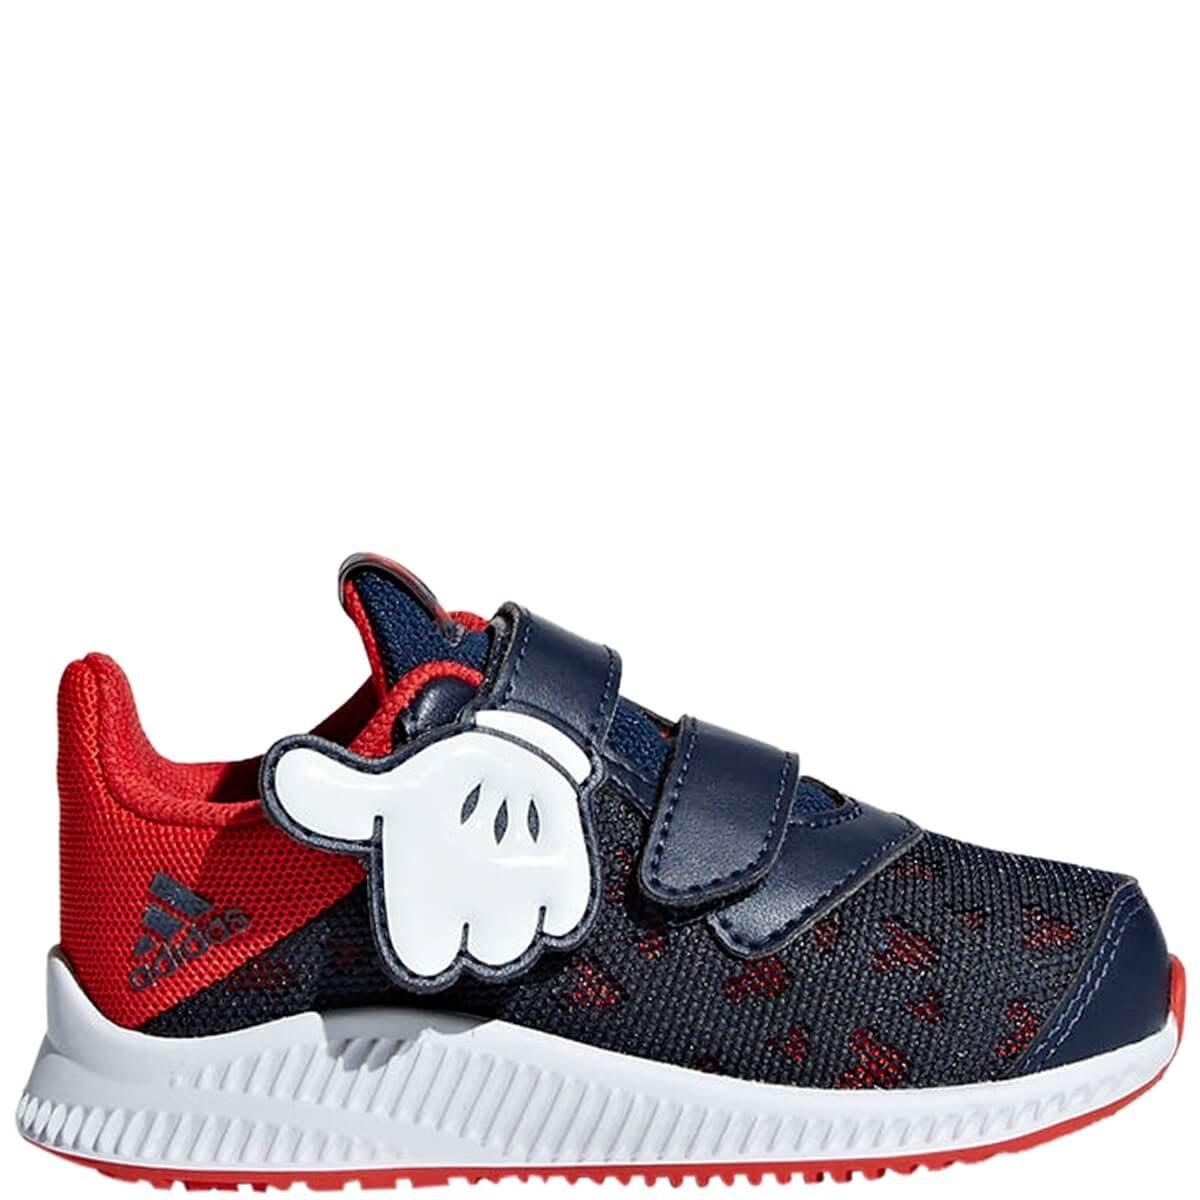 fa6d9d88cc1 Bizz Store - Tênis Infantil Menino Adidas Disney Fortarun